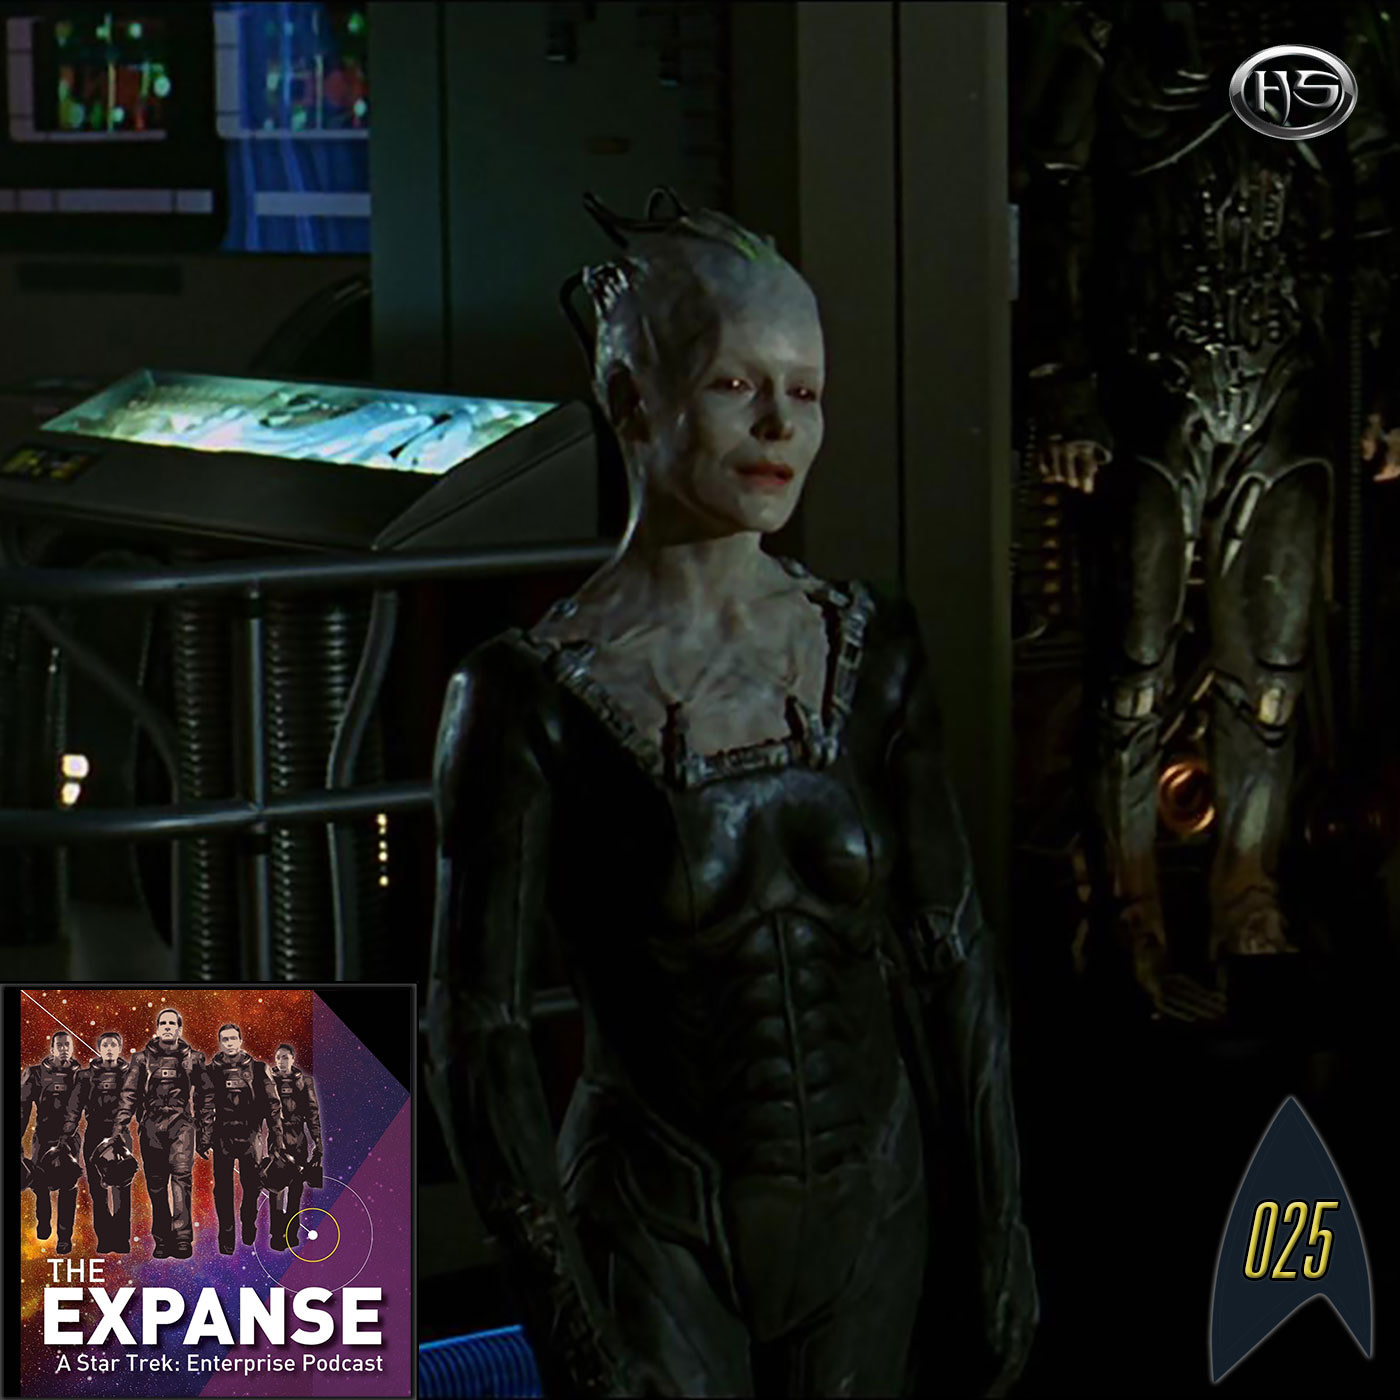 The Expanse Episode 25